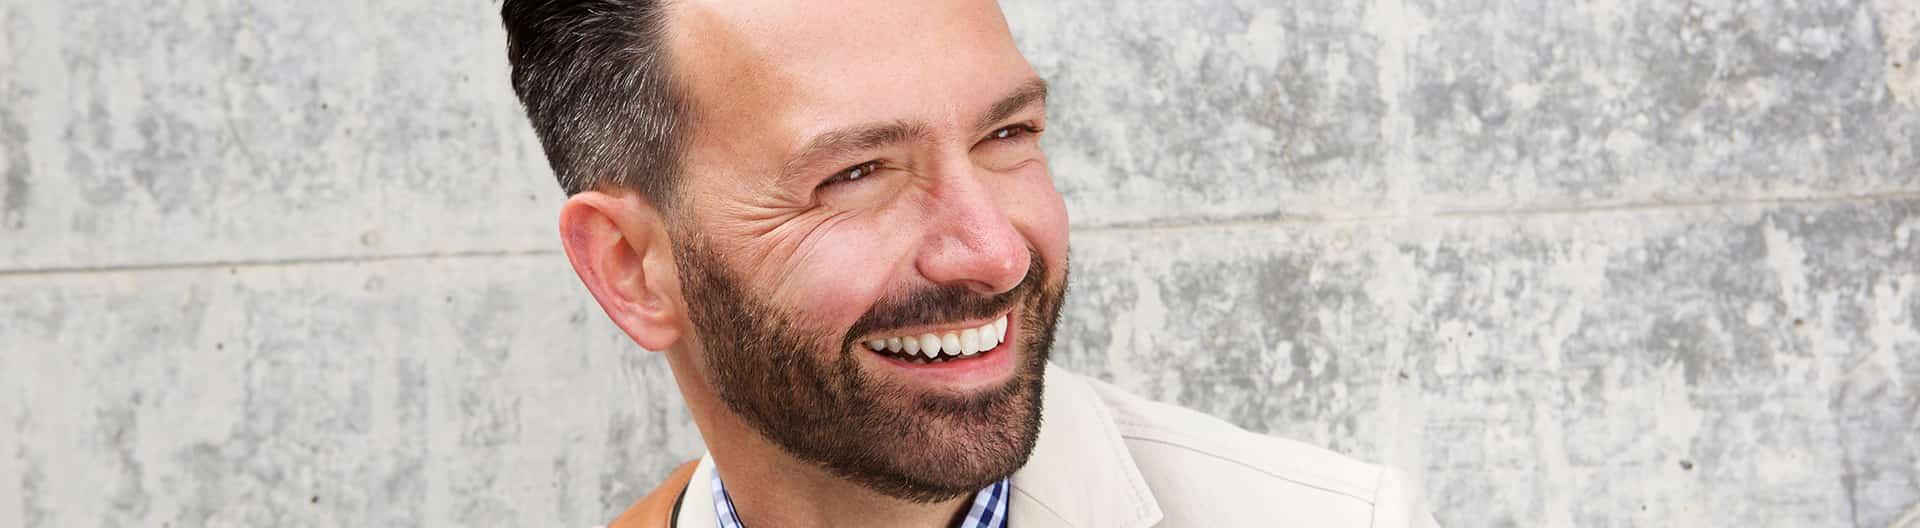 Older man smiling